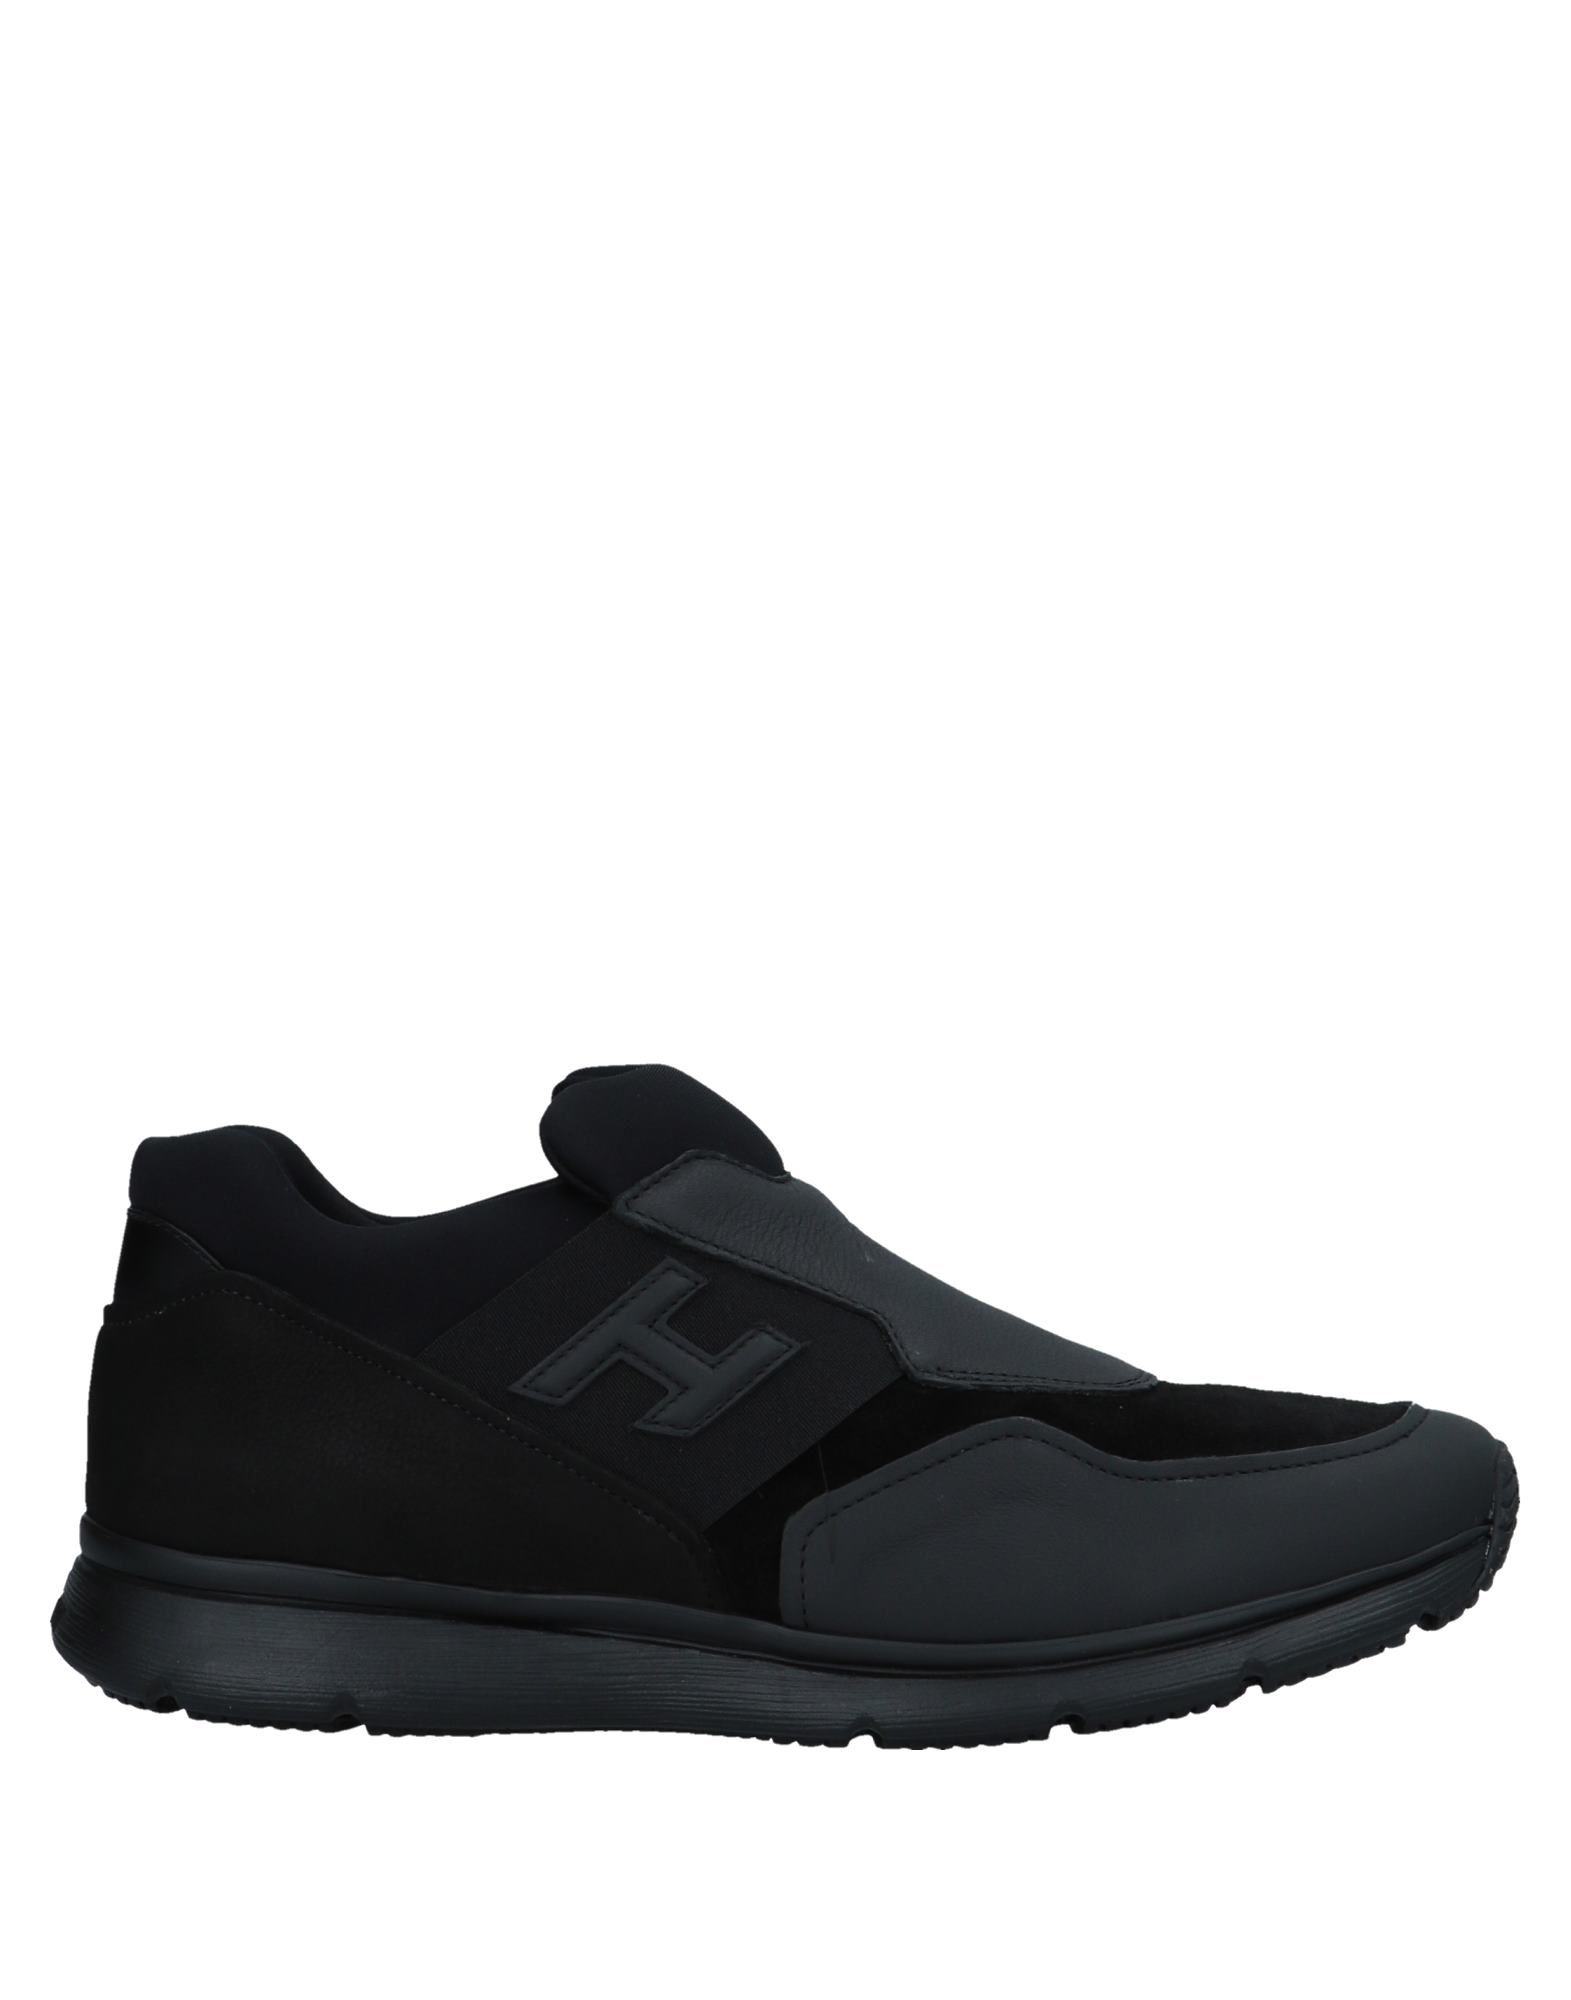 Hogan Sneakers Herren  11540693QF Gute Qualität beliebte Schuhe